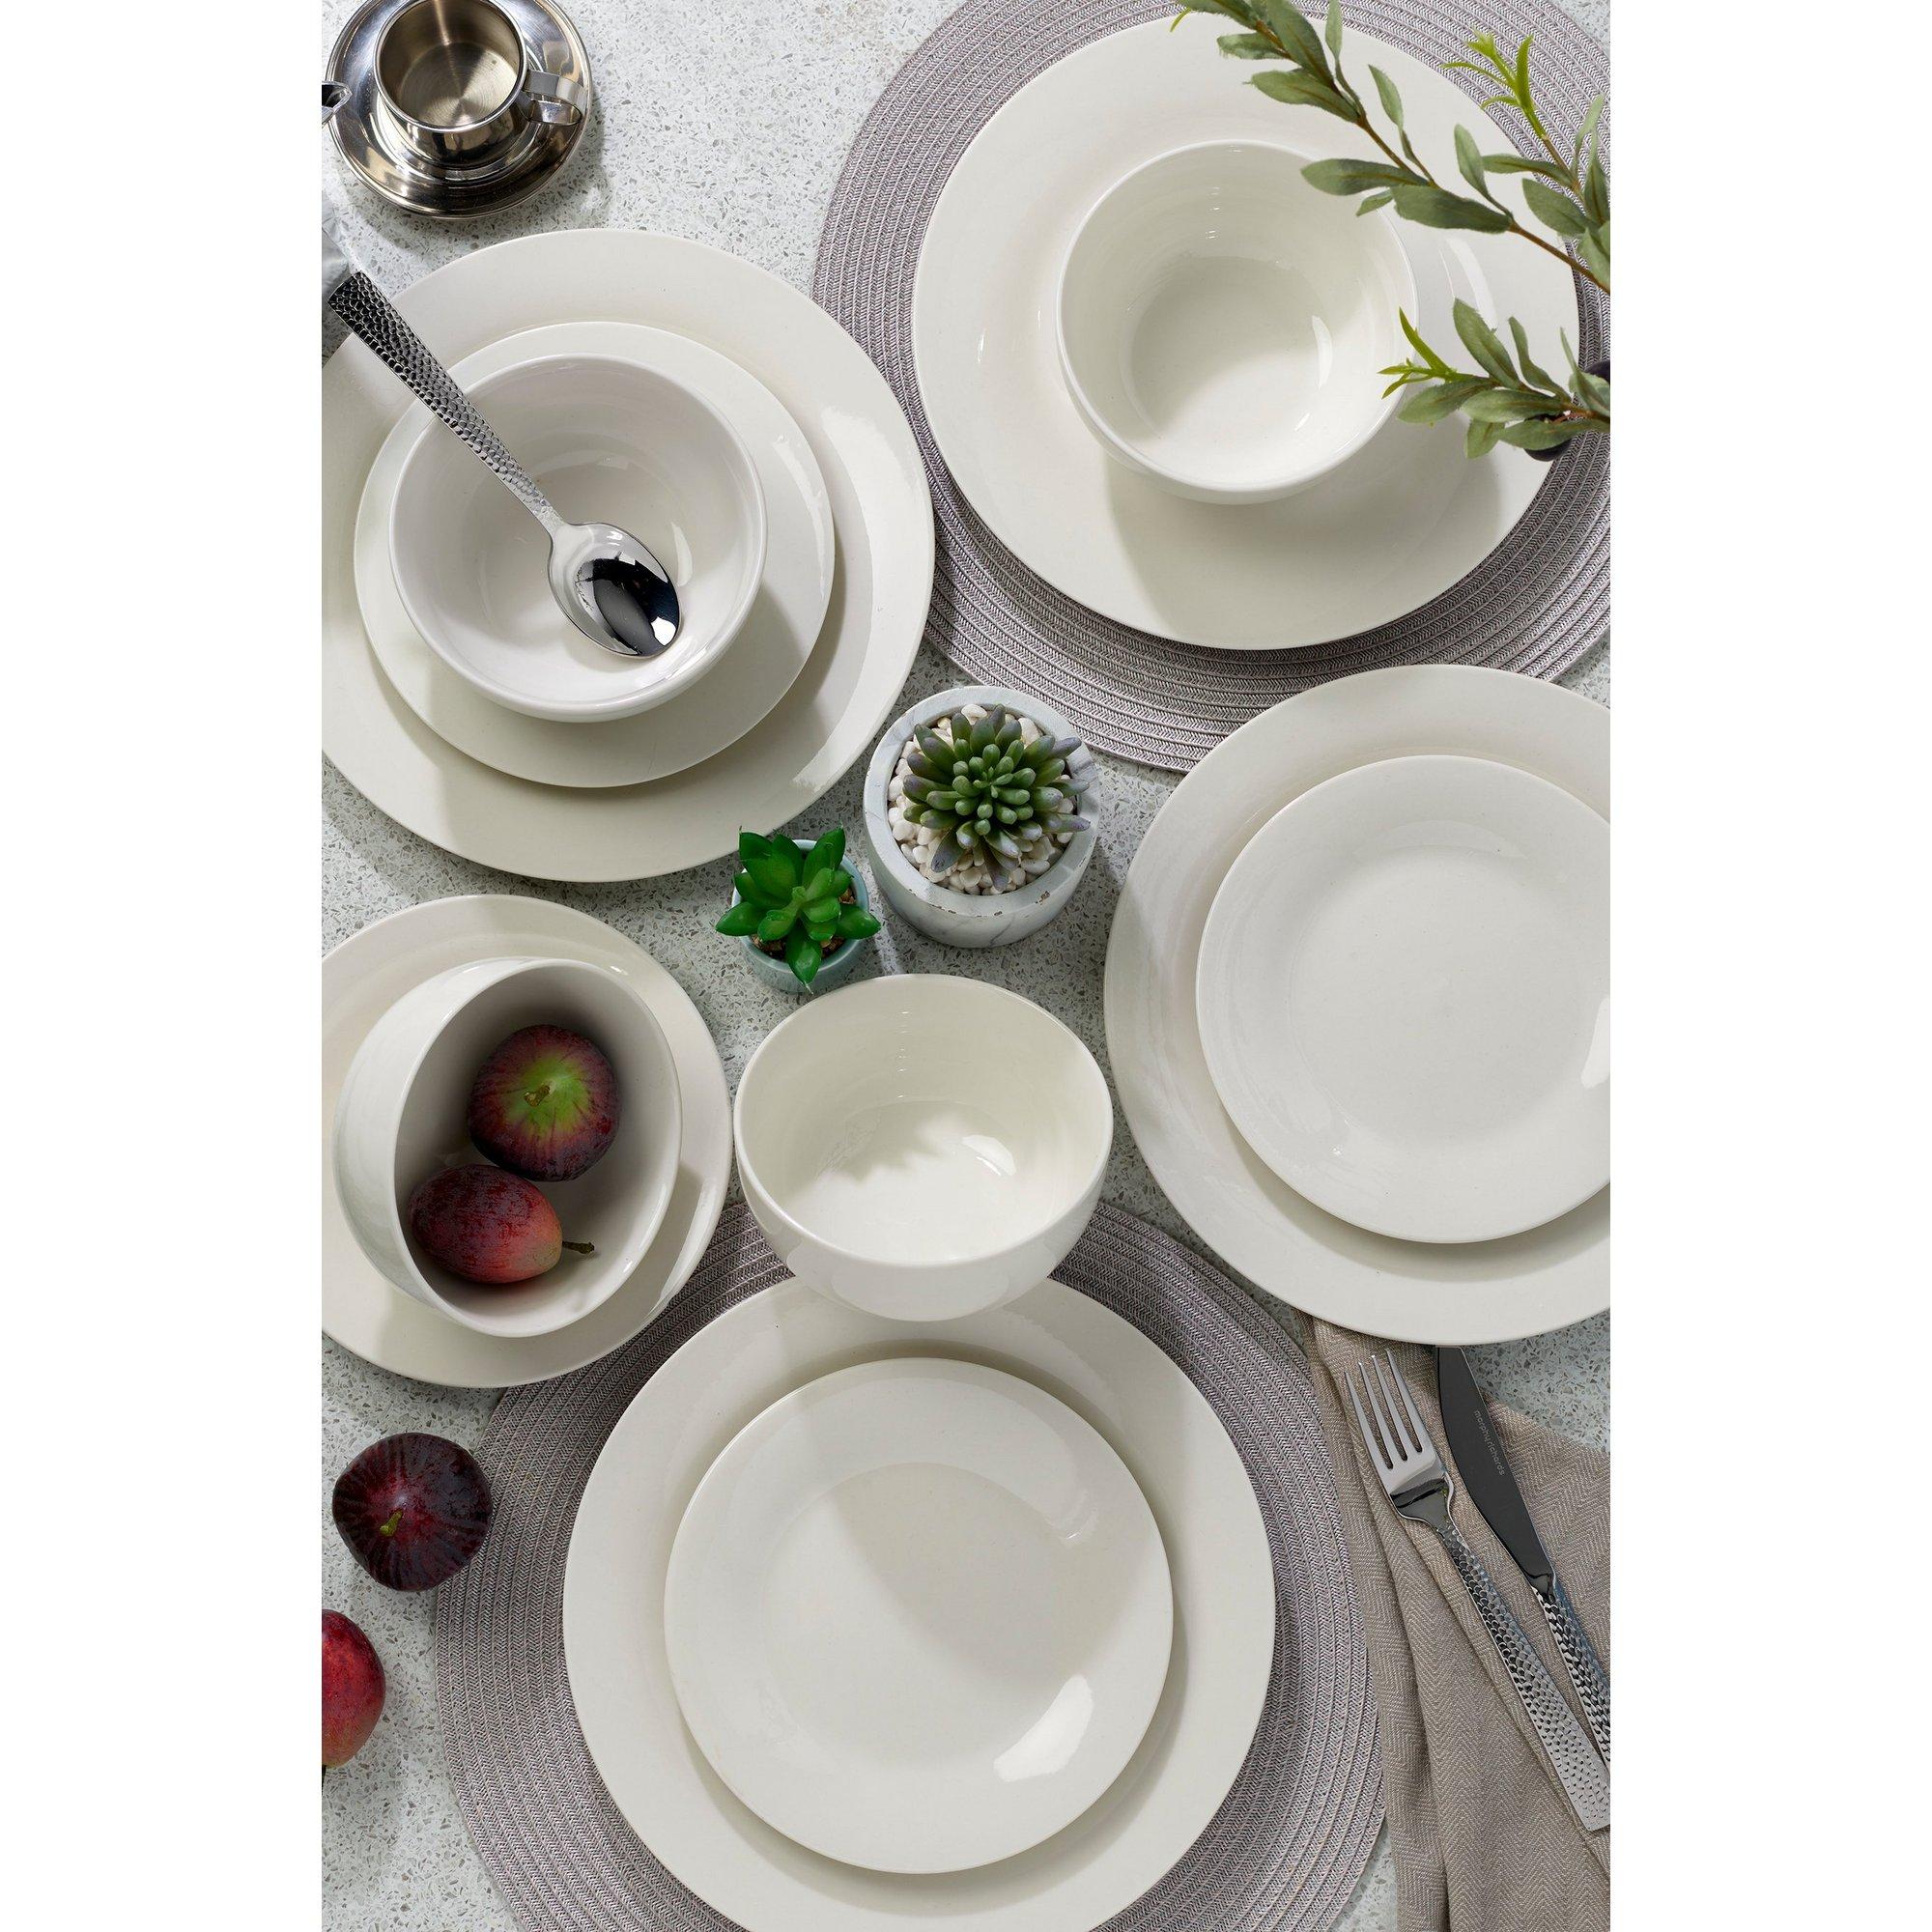 Image of 12-Piece Porcelain White Dinner Set